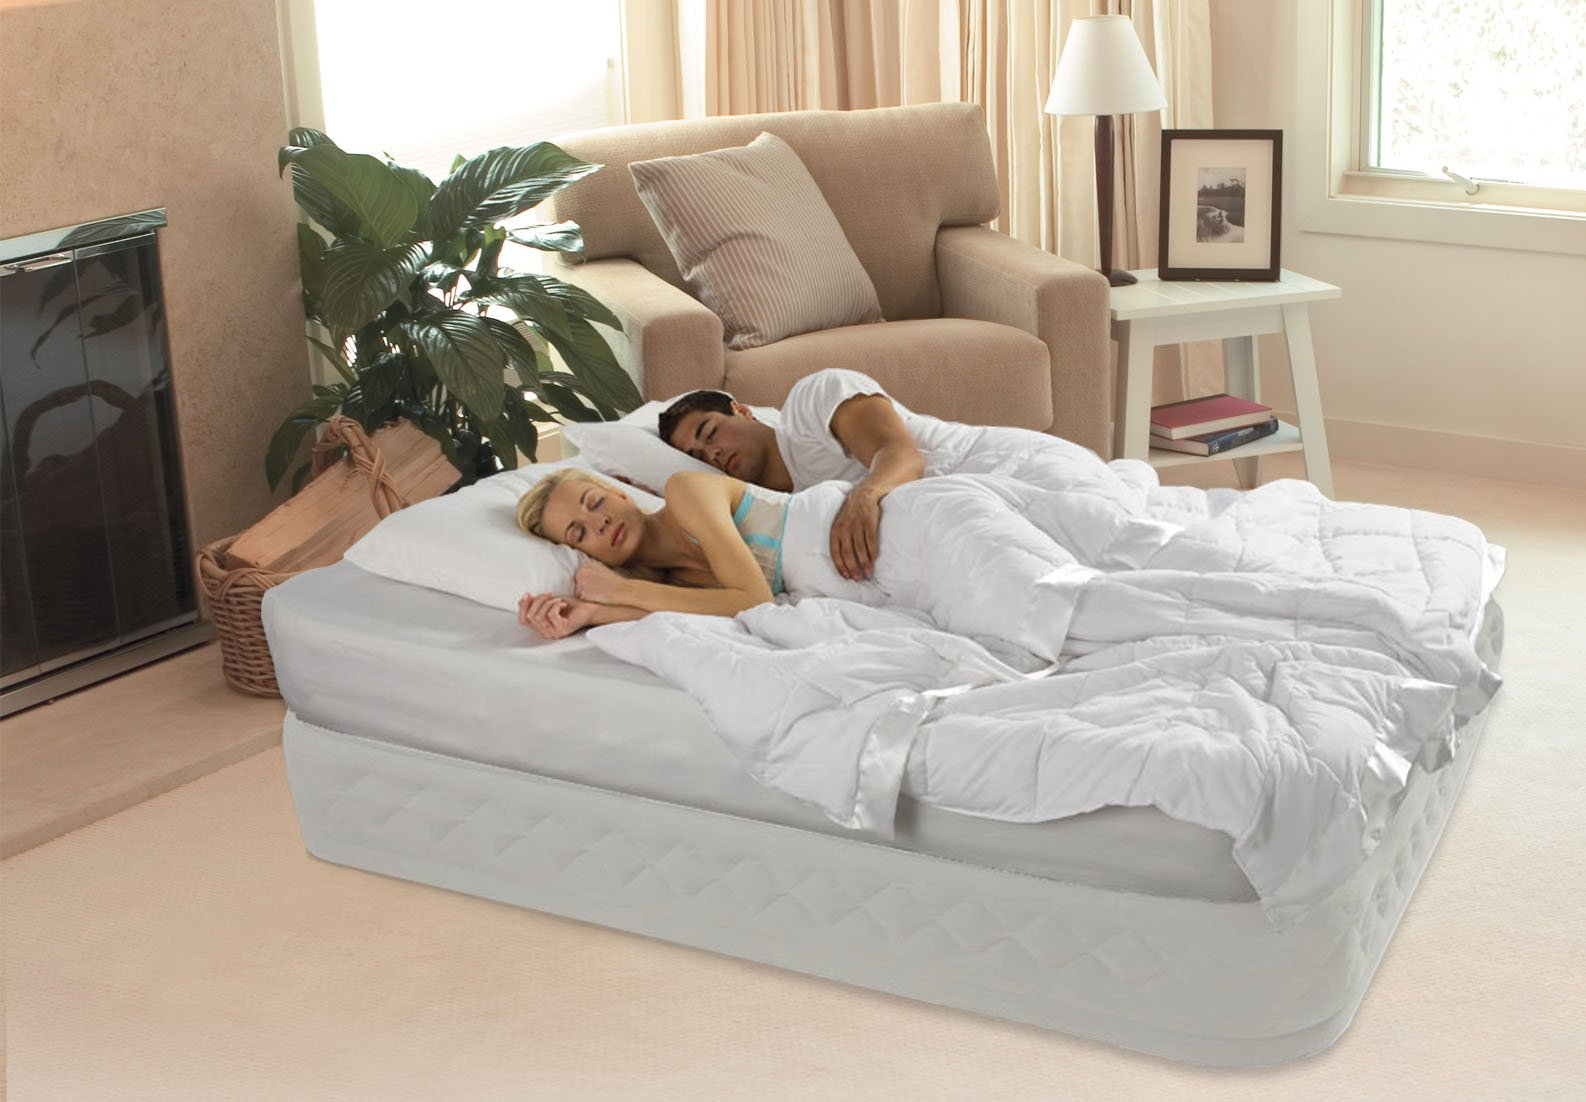 Intex Supreme Air-Flow Bed Queen